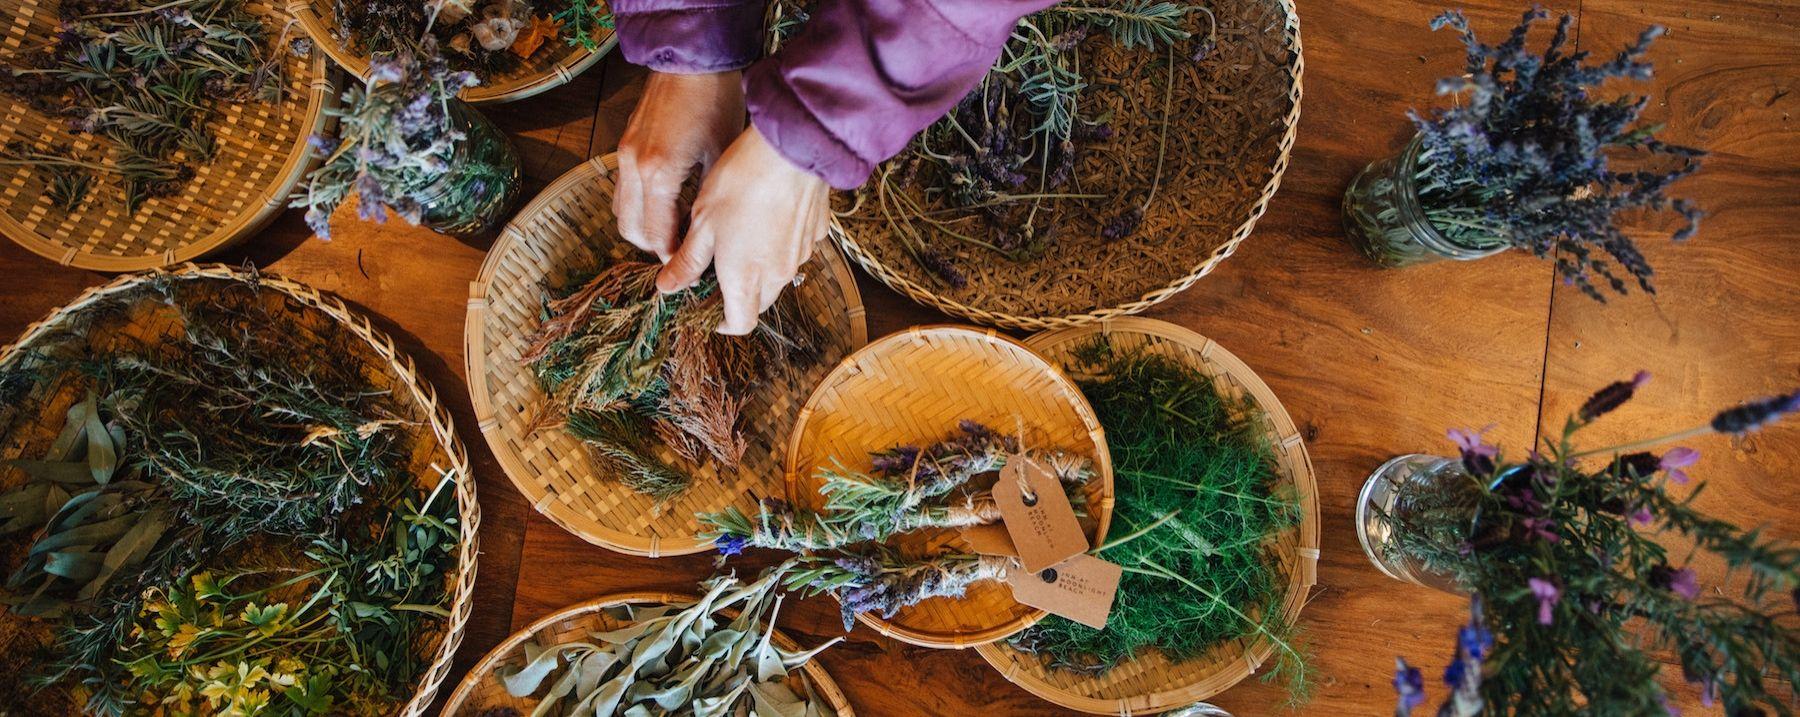 a person handling herbs